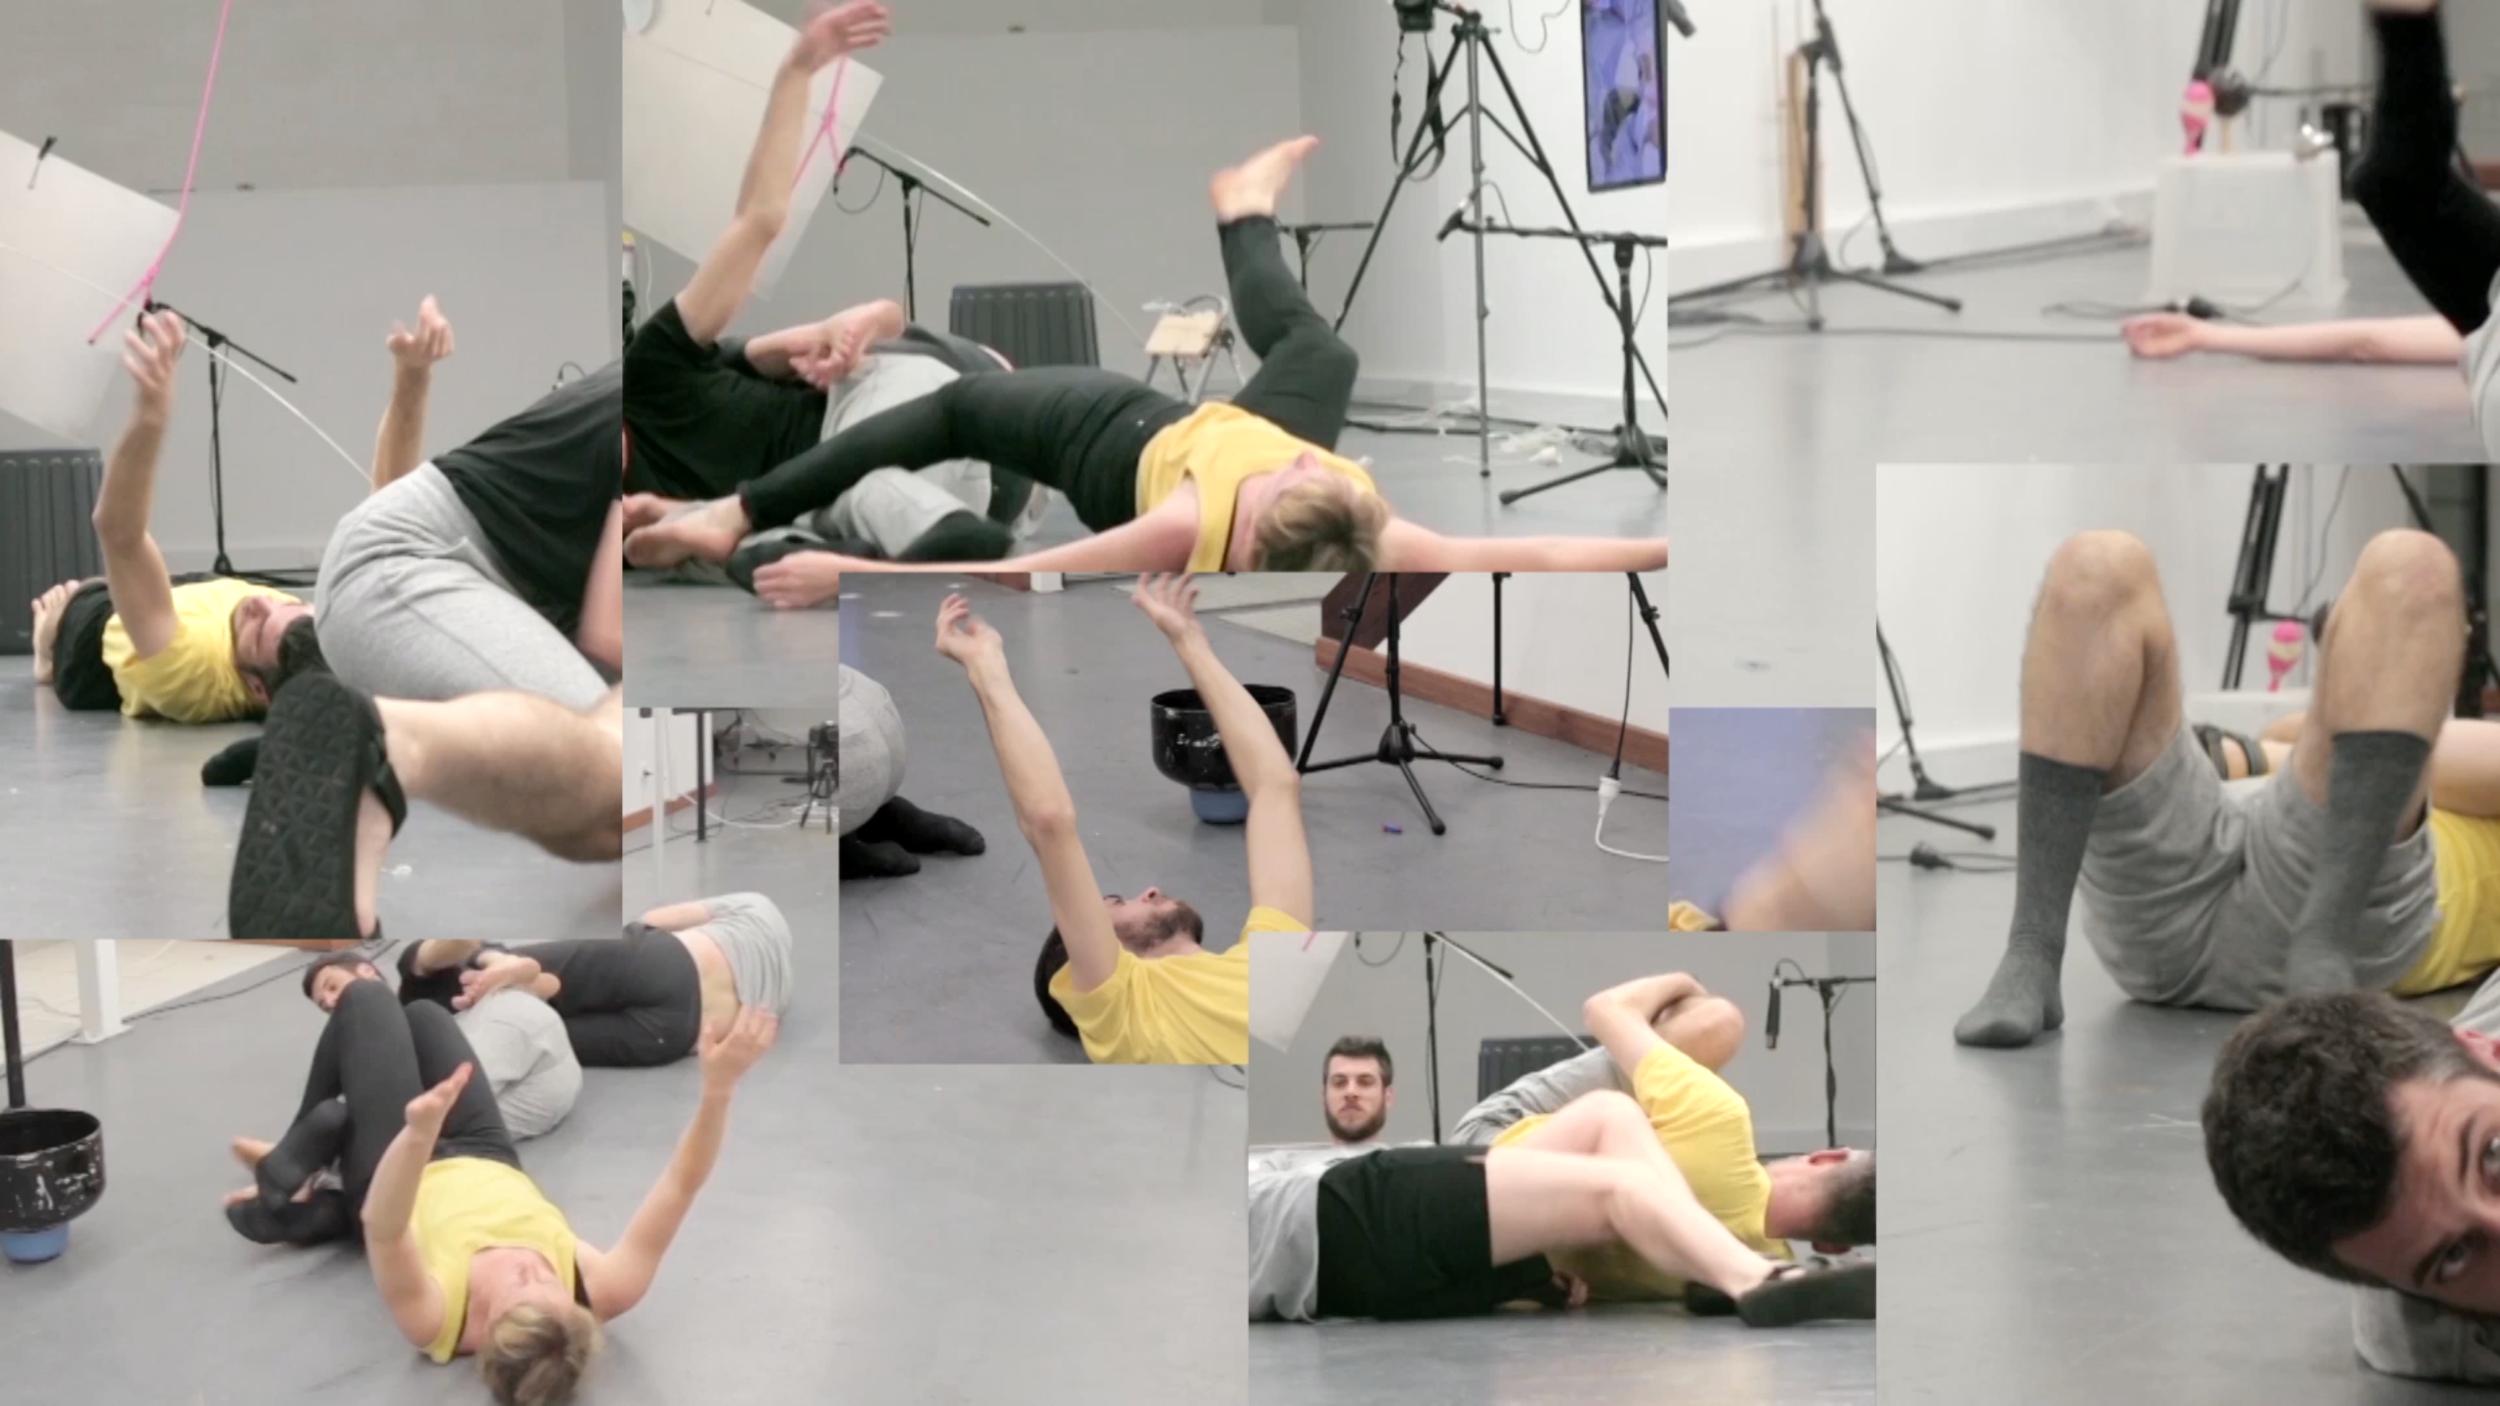 The Shakes, 2016 - Video Still